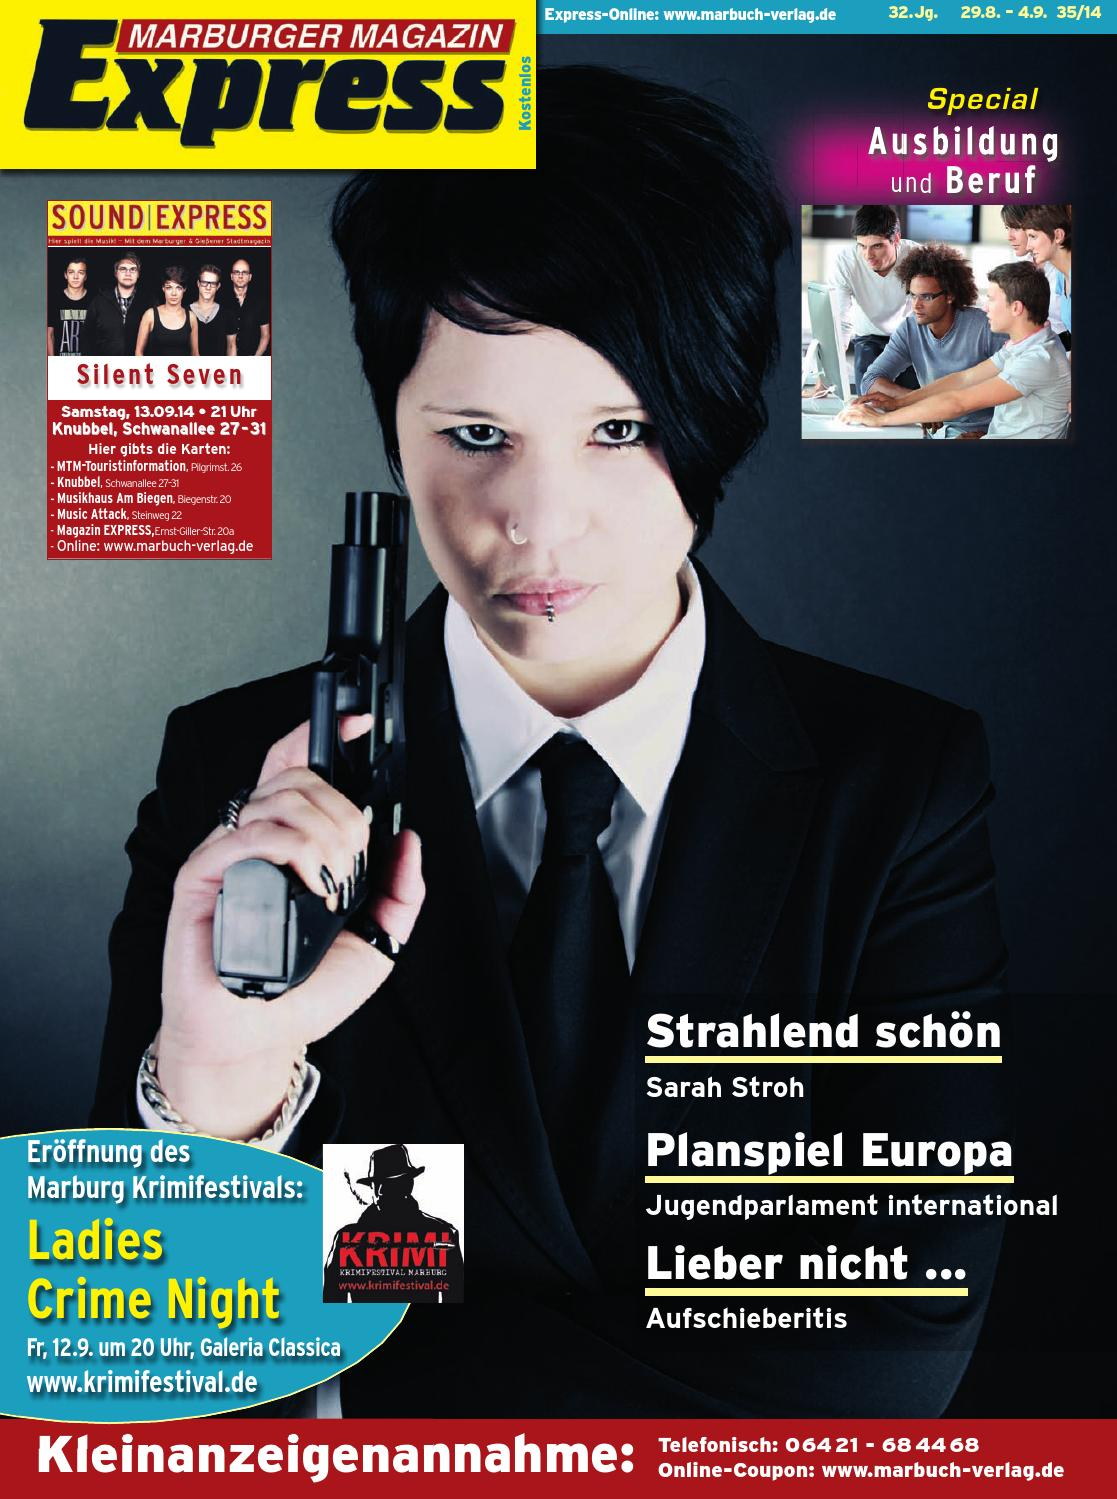 marburger magazin express 35 2014 by ulrich butterweck issuu. Black Bedroom Furniture Sets. Home Design Ideas